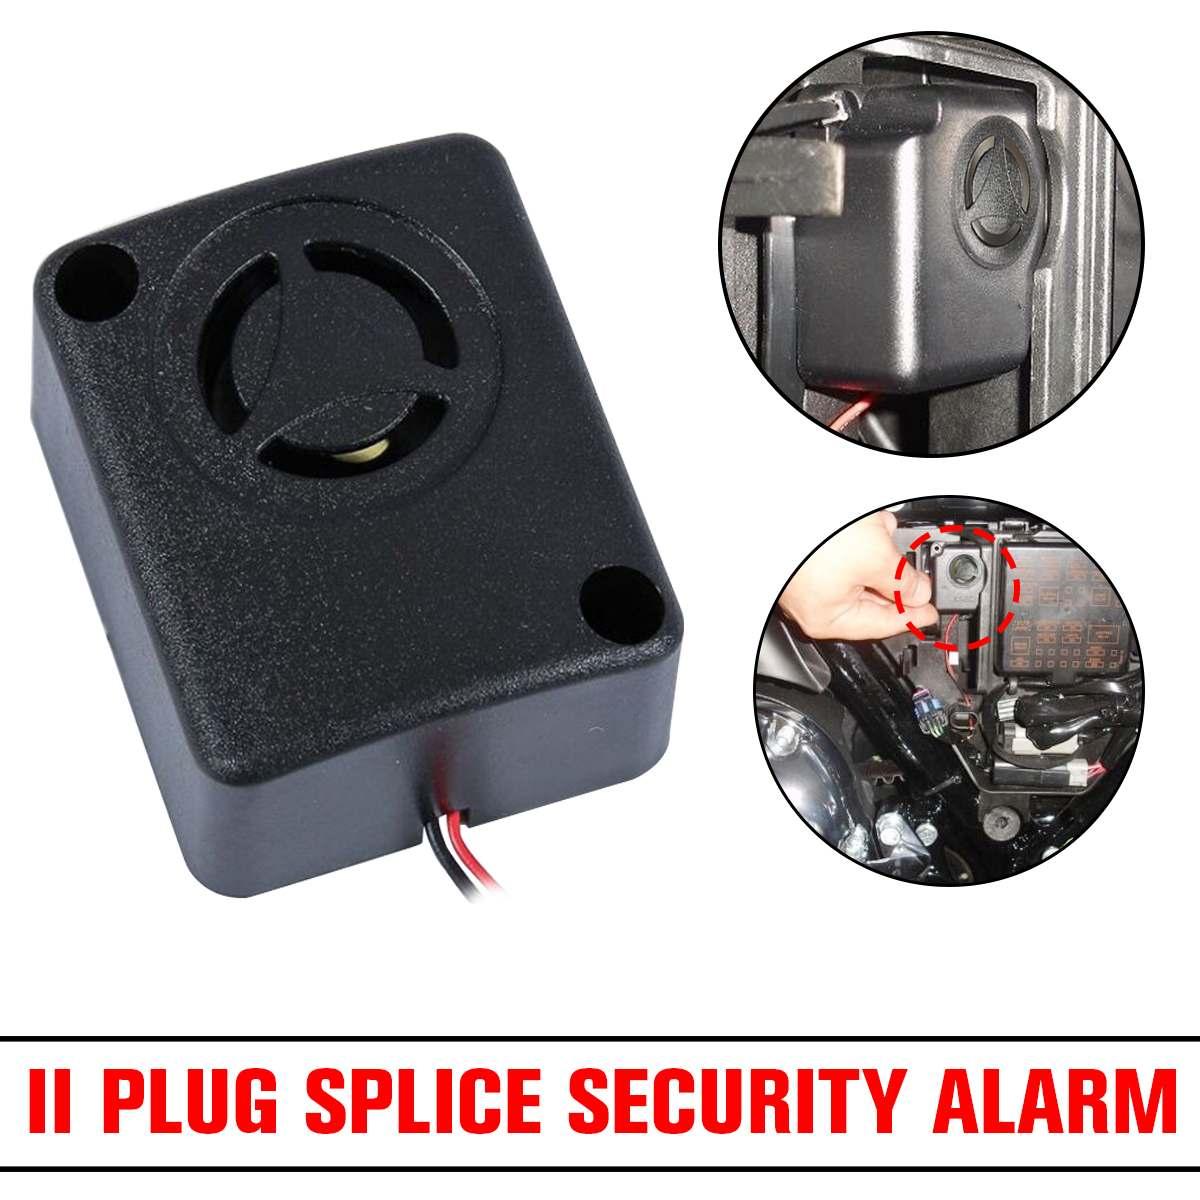 NEW 1pcs Mini 120dB Alarm Motorcycle Alarm Piezo Wired Rohs 12V Black Continuous Sound Alarm